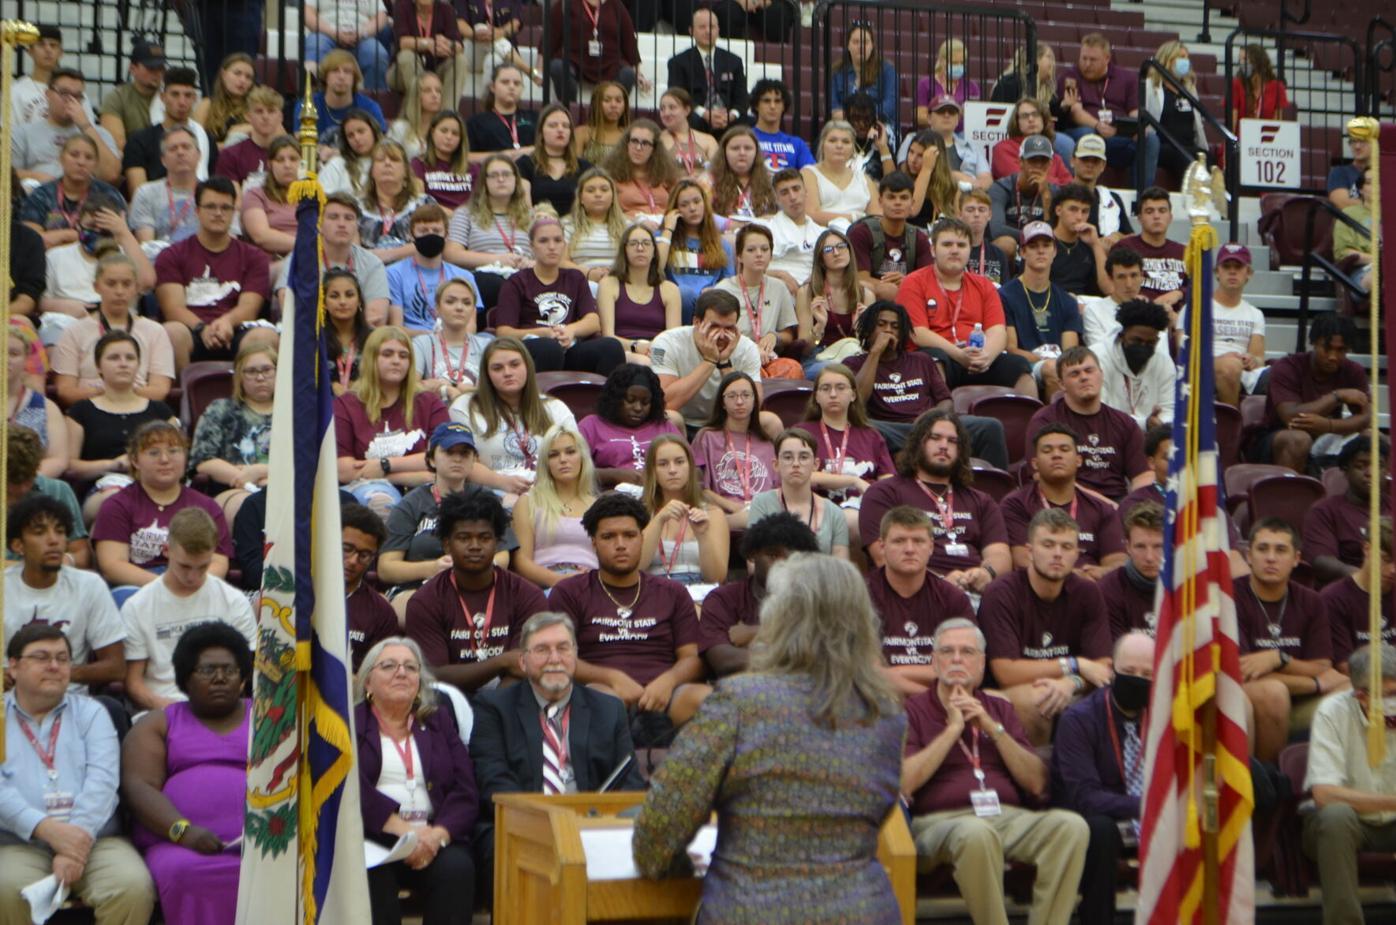 FSU convocation - Martin with crowd